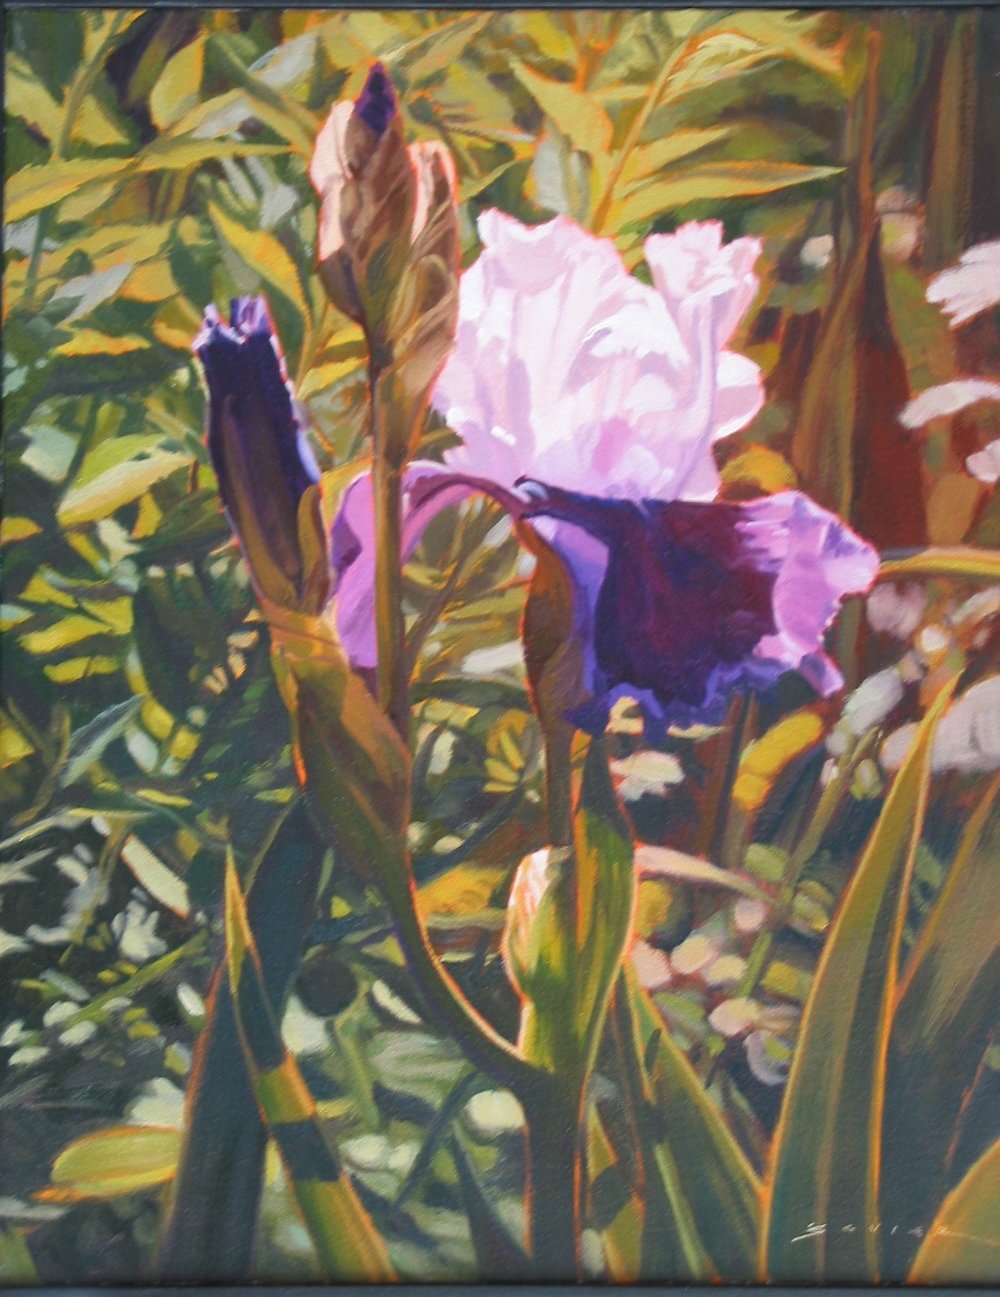 Iris, 20 x 16, oil